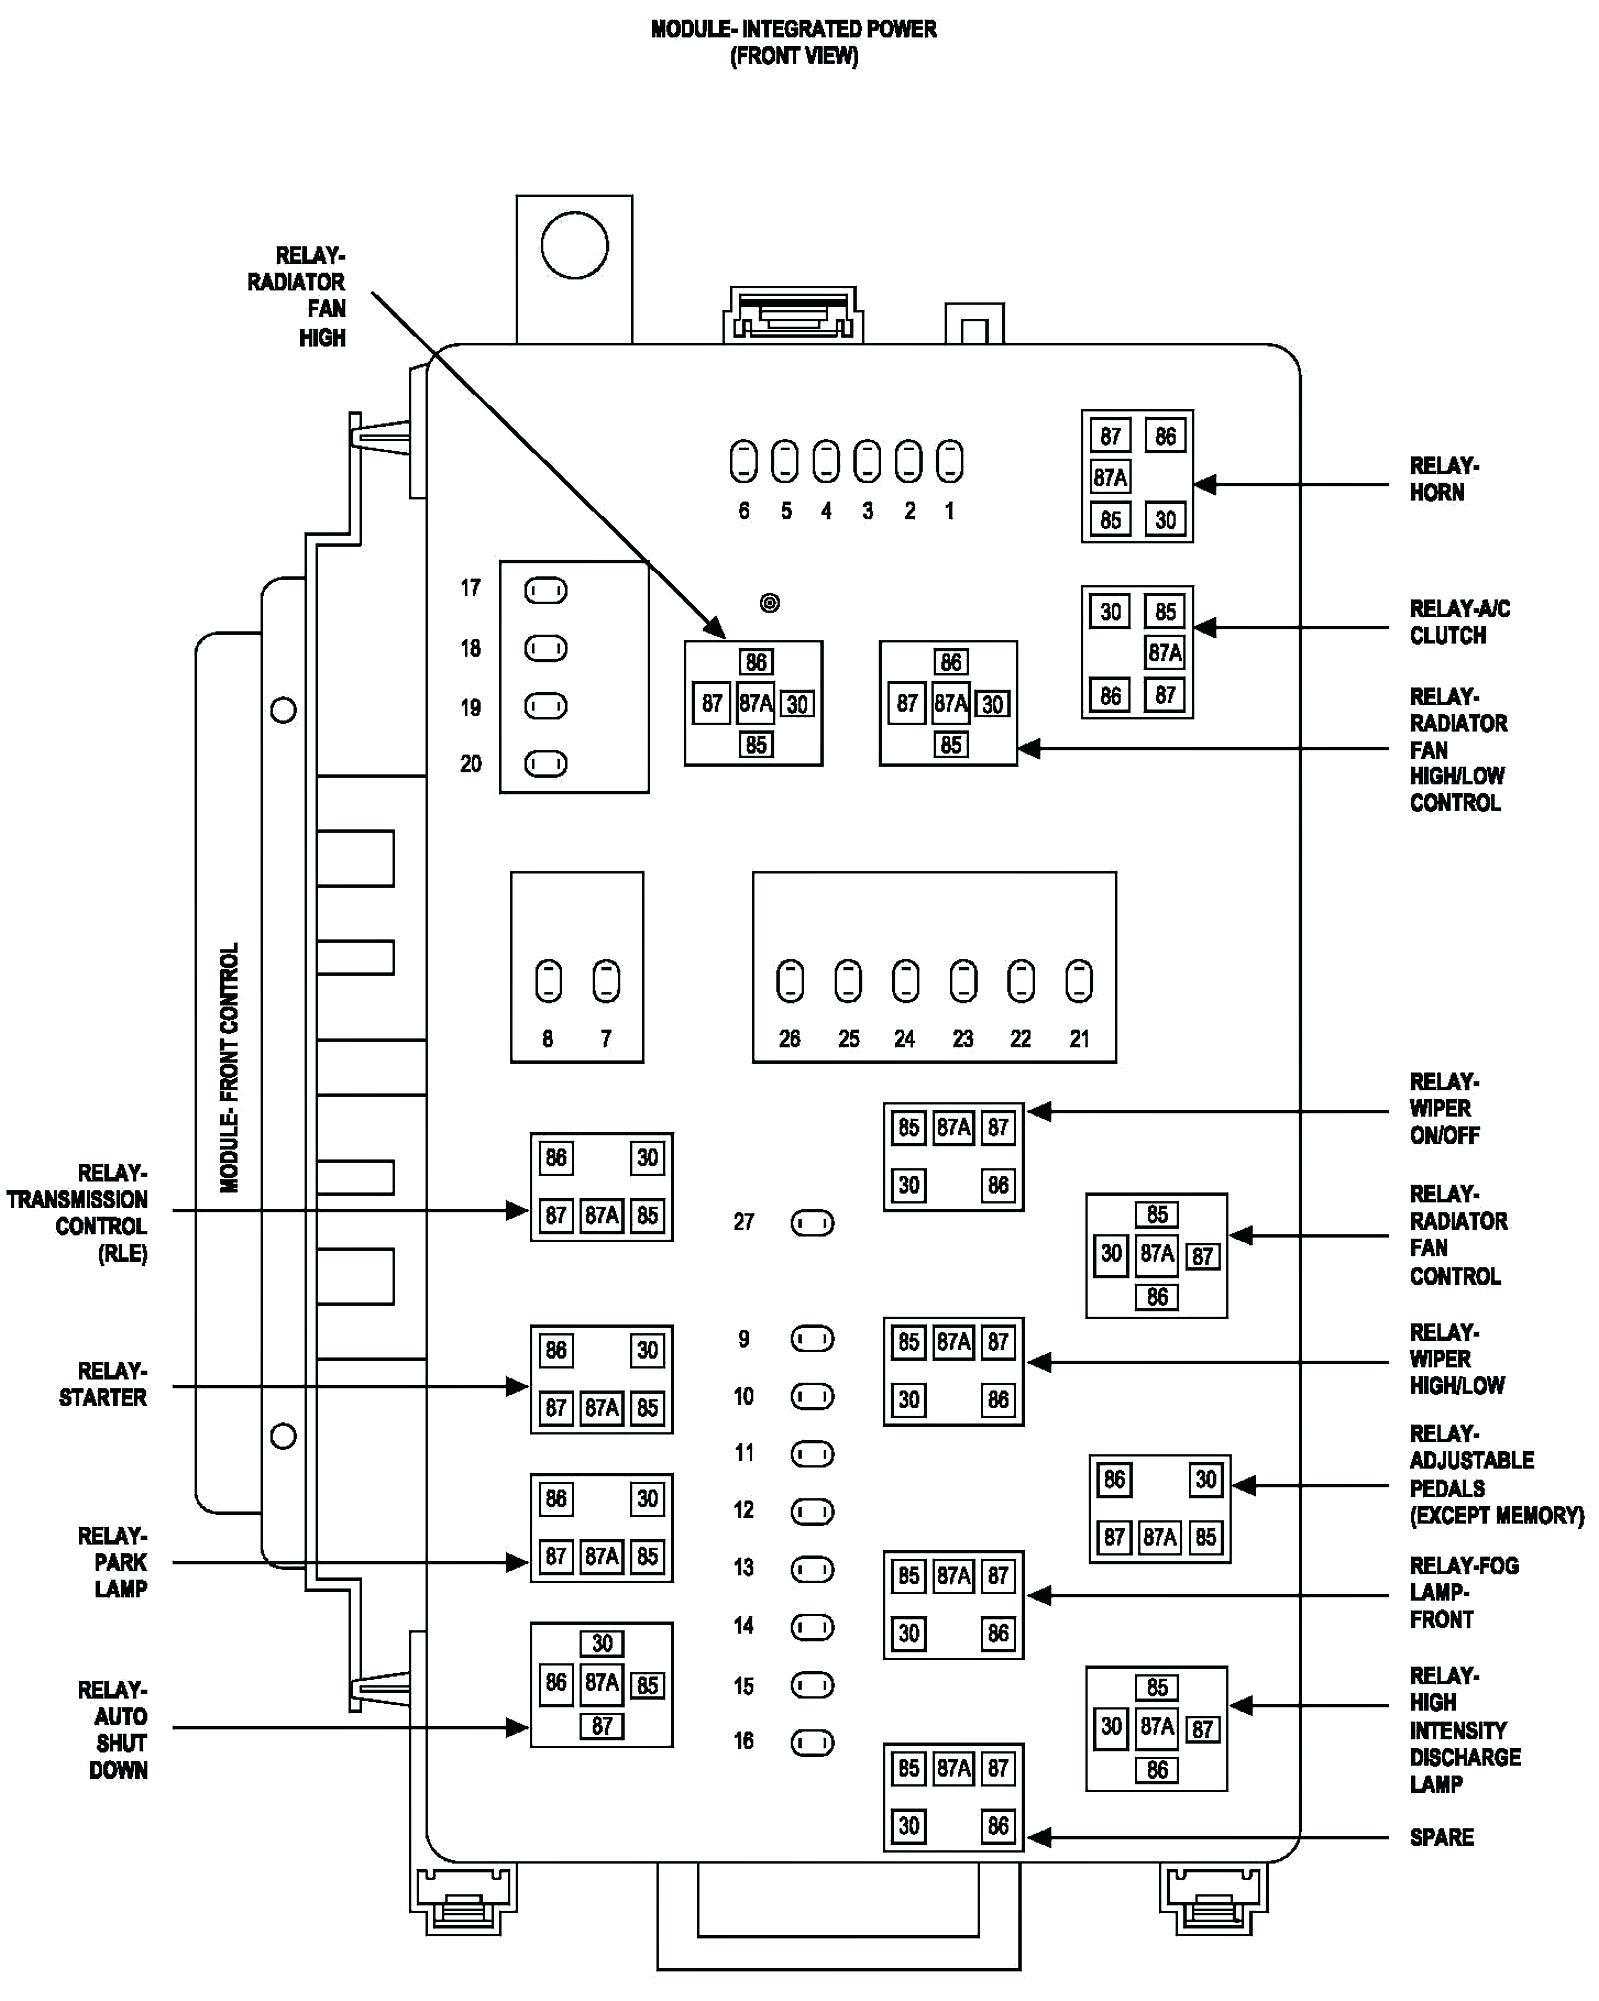 saab 9 3 fuse box 2006 gl 9399  fuse box map 130x300 2005 dodge magnum underhood wiring  fuse box map 130x300 2005 dodge magnum